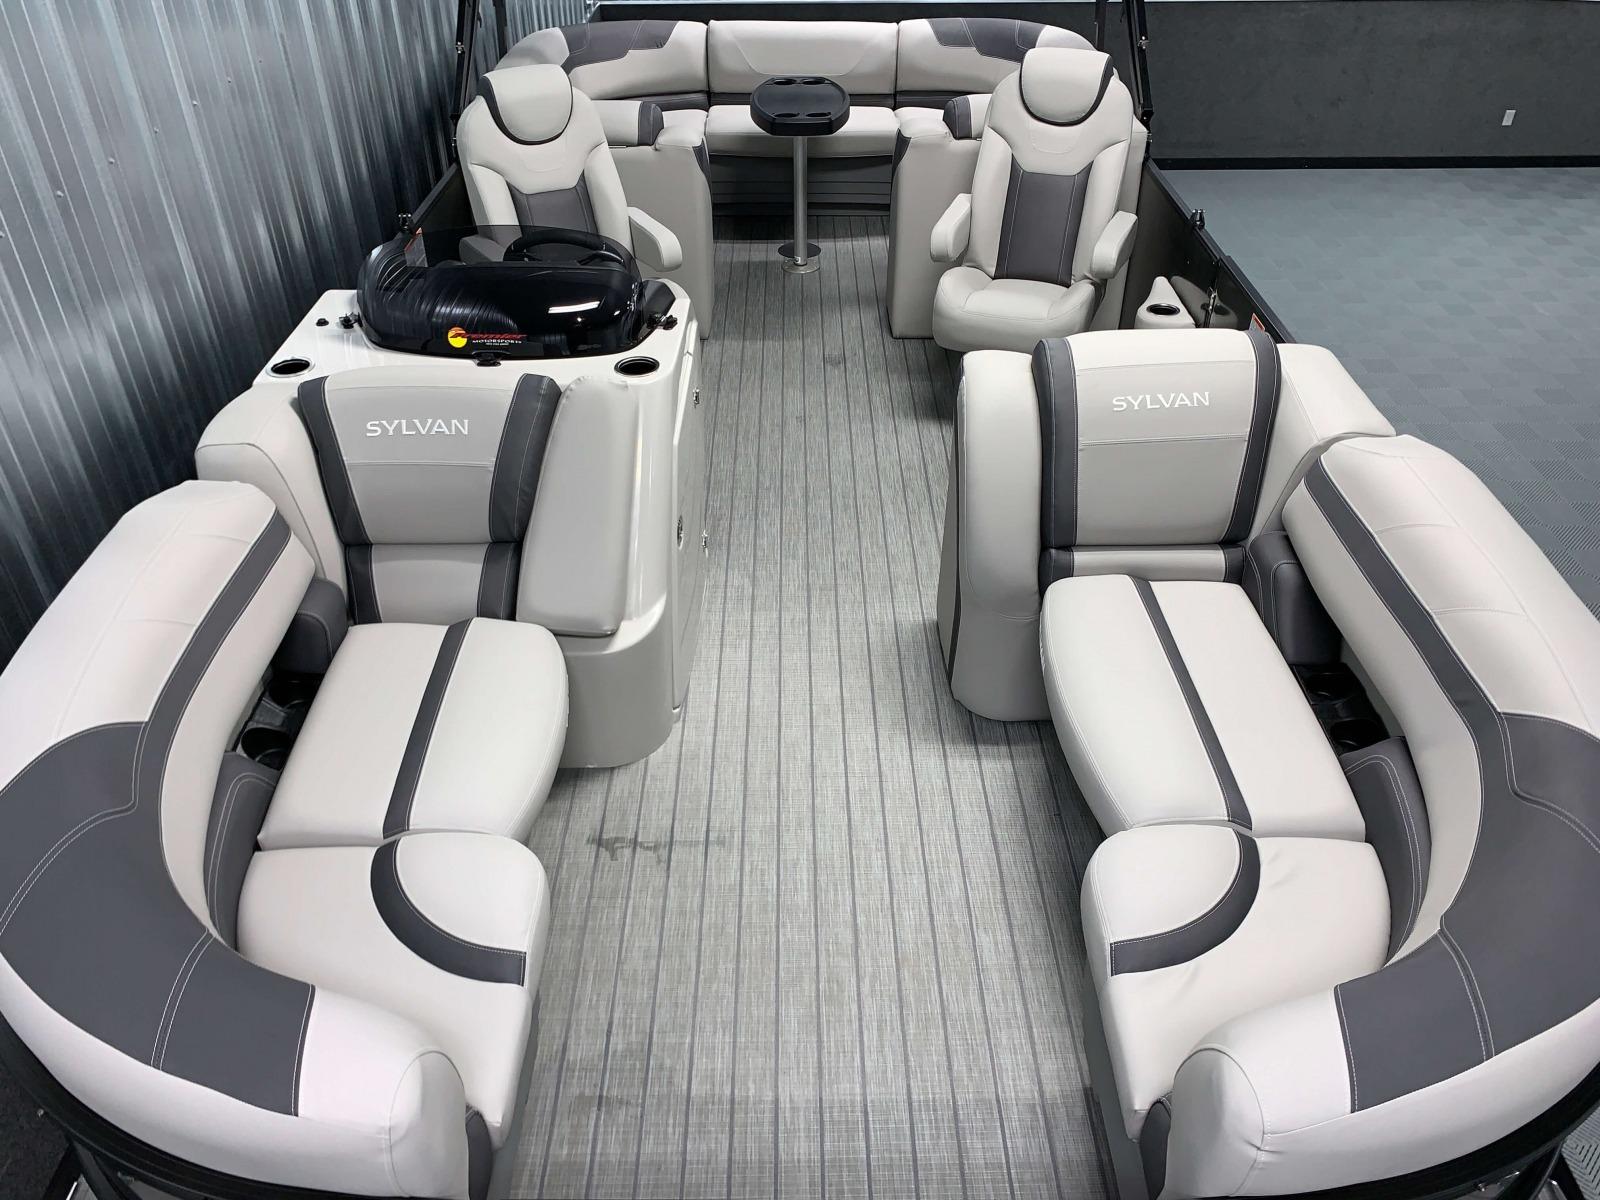 Interior Layout of the 2021 Sylvan L3 LZ Tritoon Boat